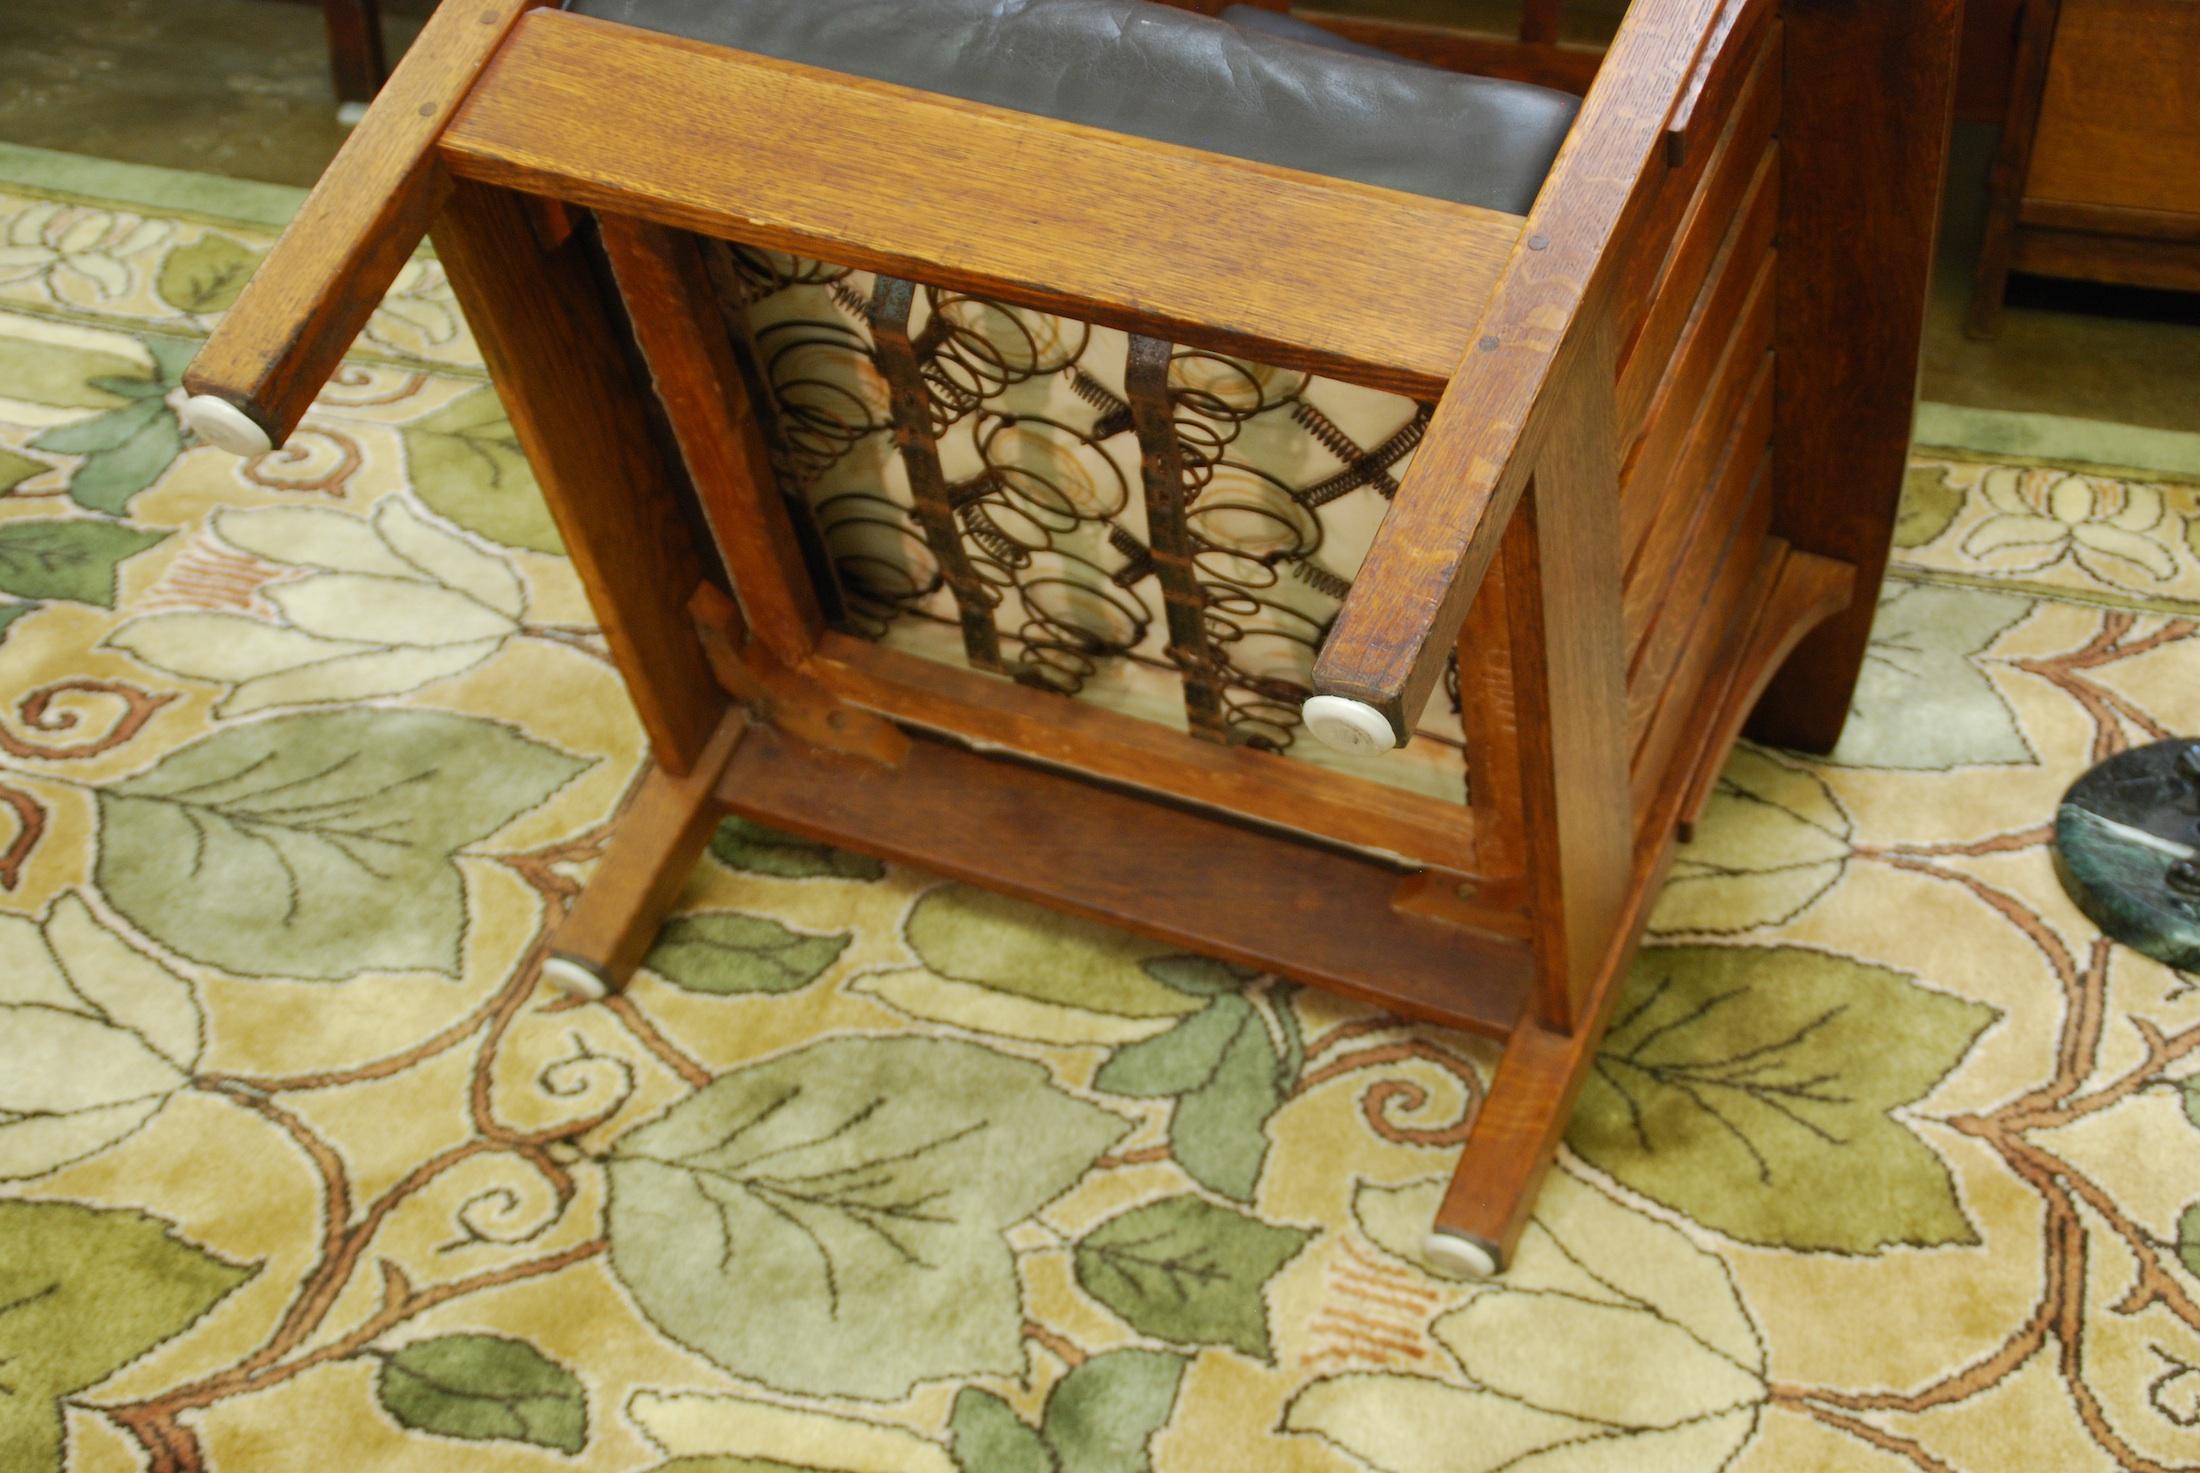 Antique stickley morris chair - Original Bevel To The Bottom Of The Feet